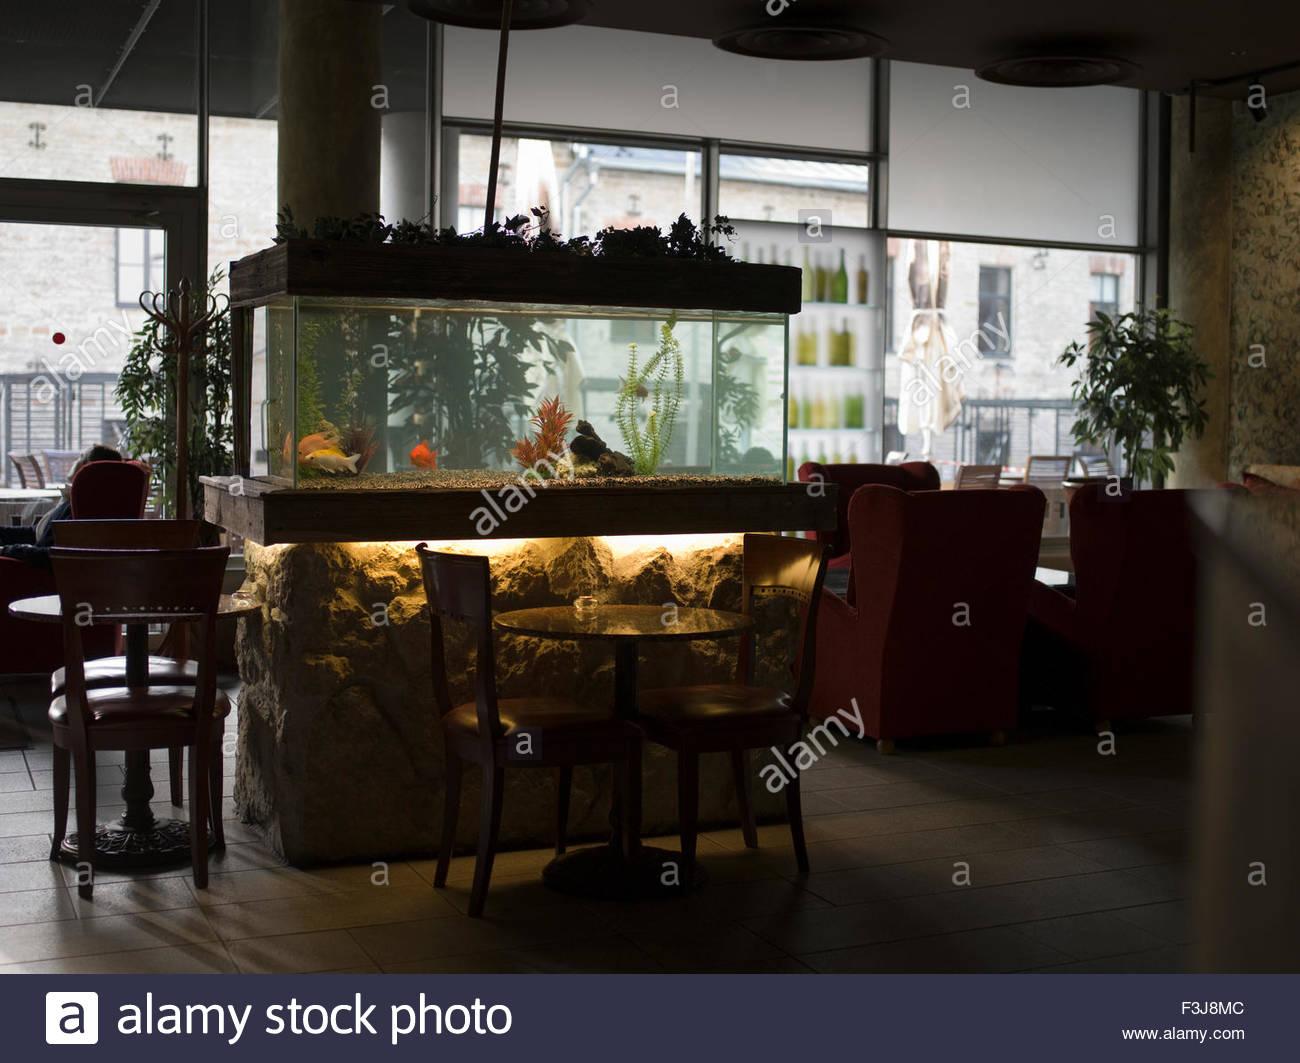 cafe coffee shop - tallinn estonia europe - (medium format stock